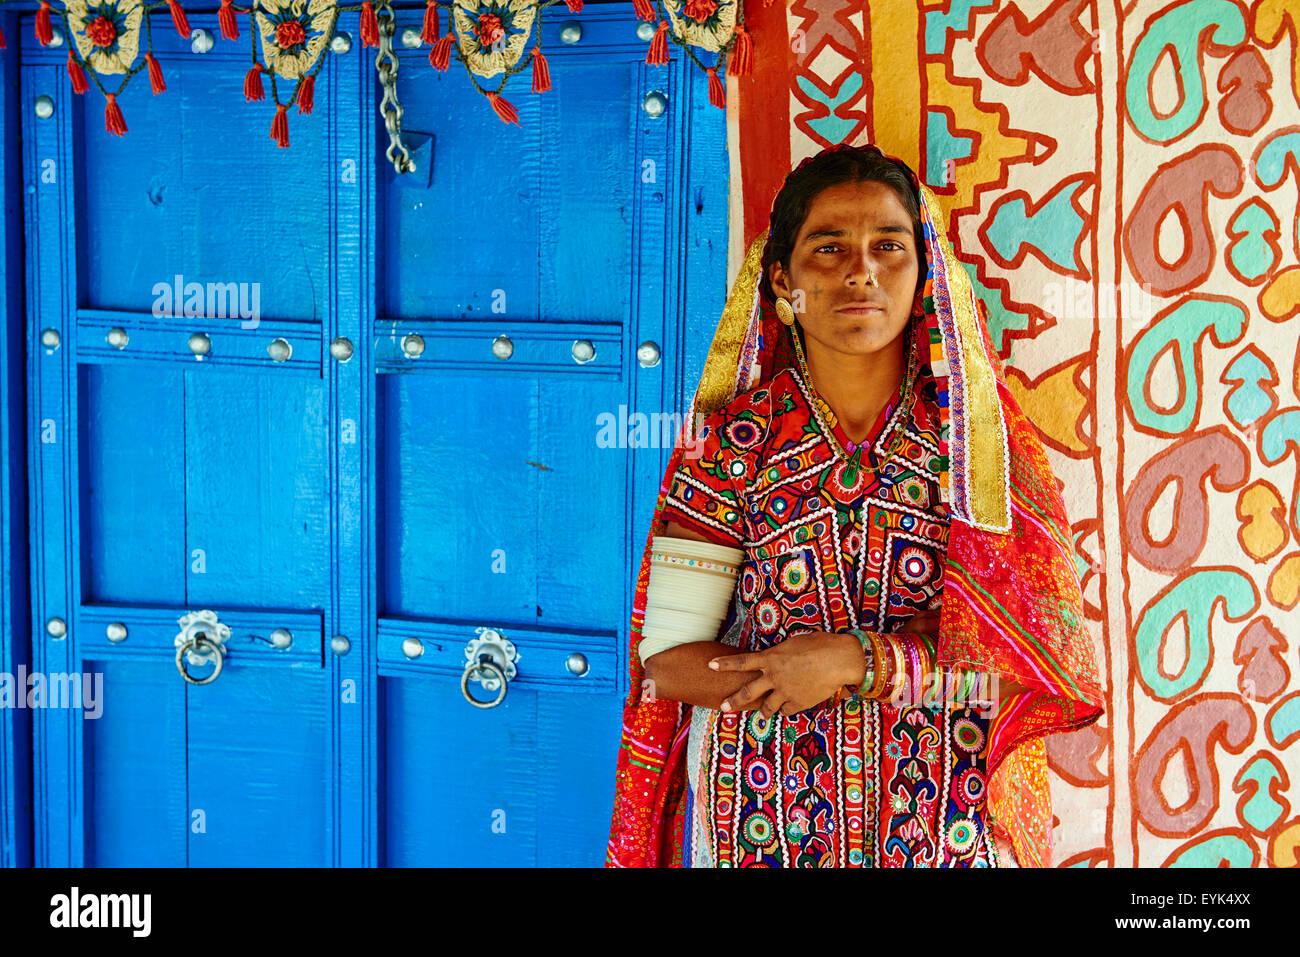 India, Gujarat, Kutch, Hodka village, Harijan ethnic group - Stock Image